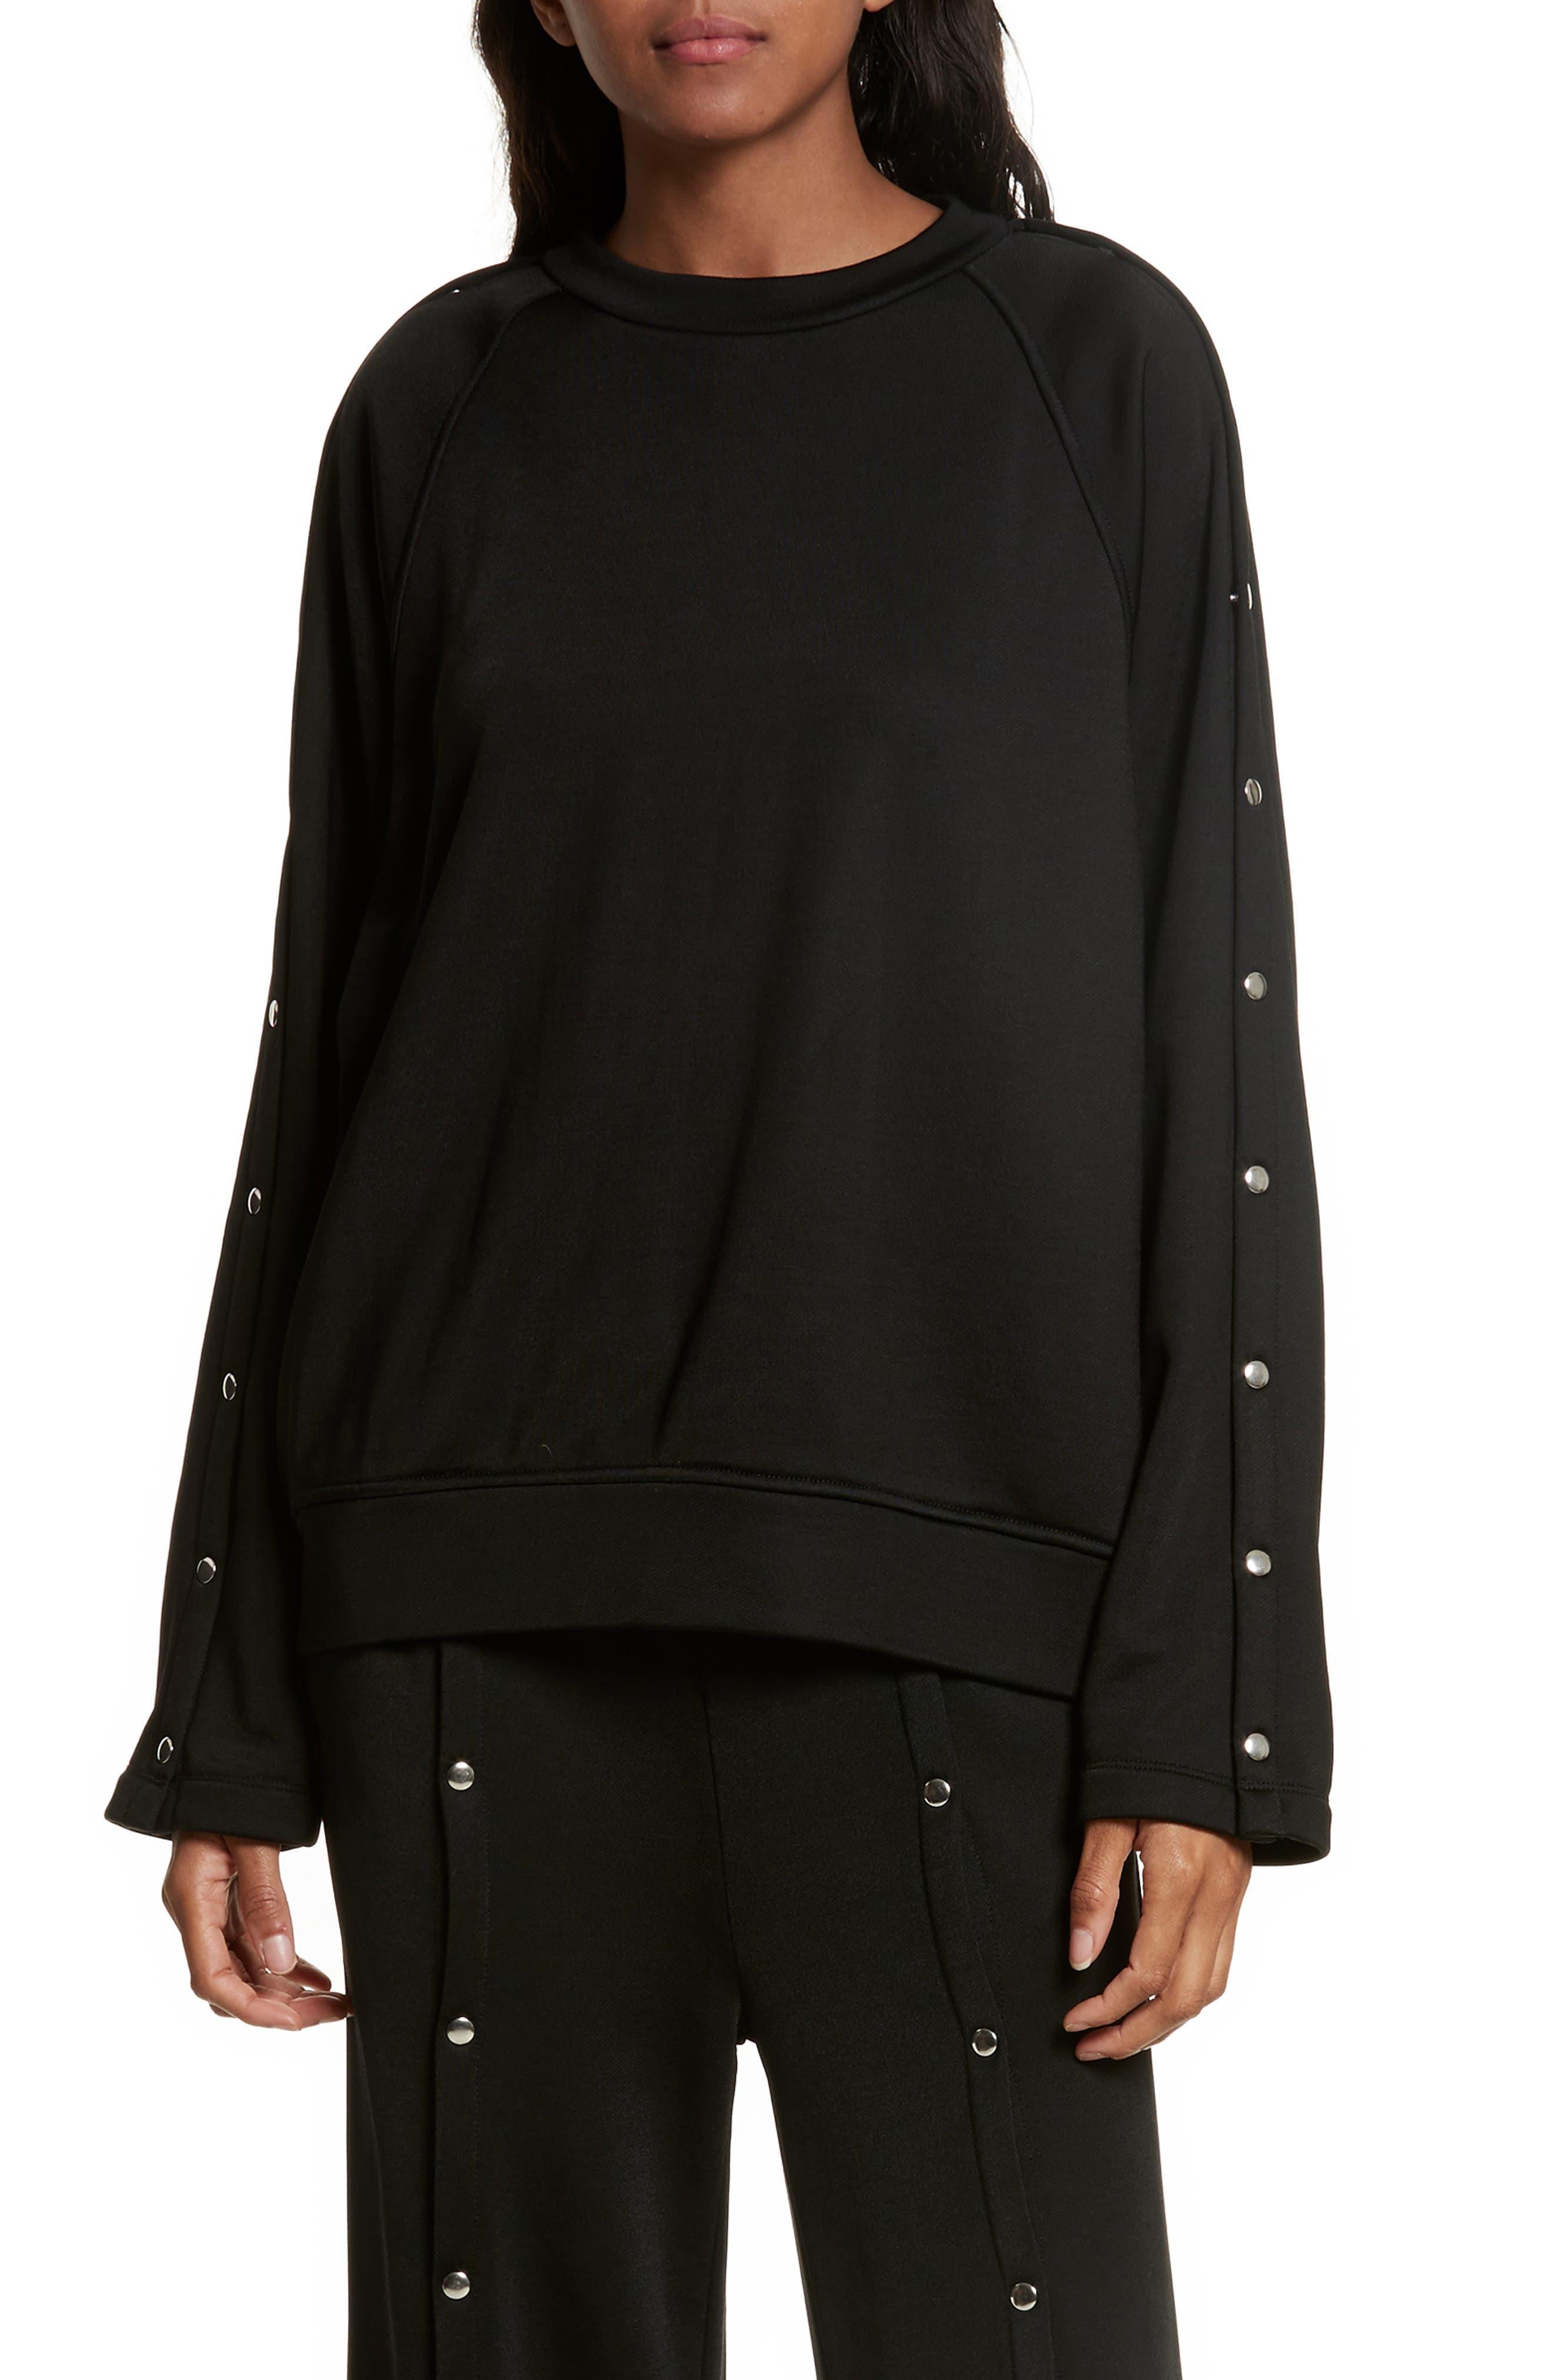 French Terry Sweatshirt,                             Main thumbnail 1, color,                             Black